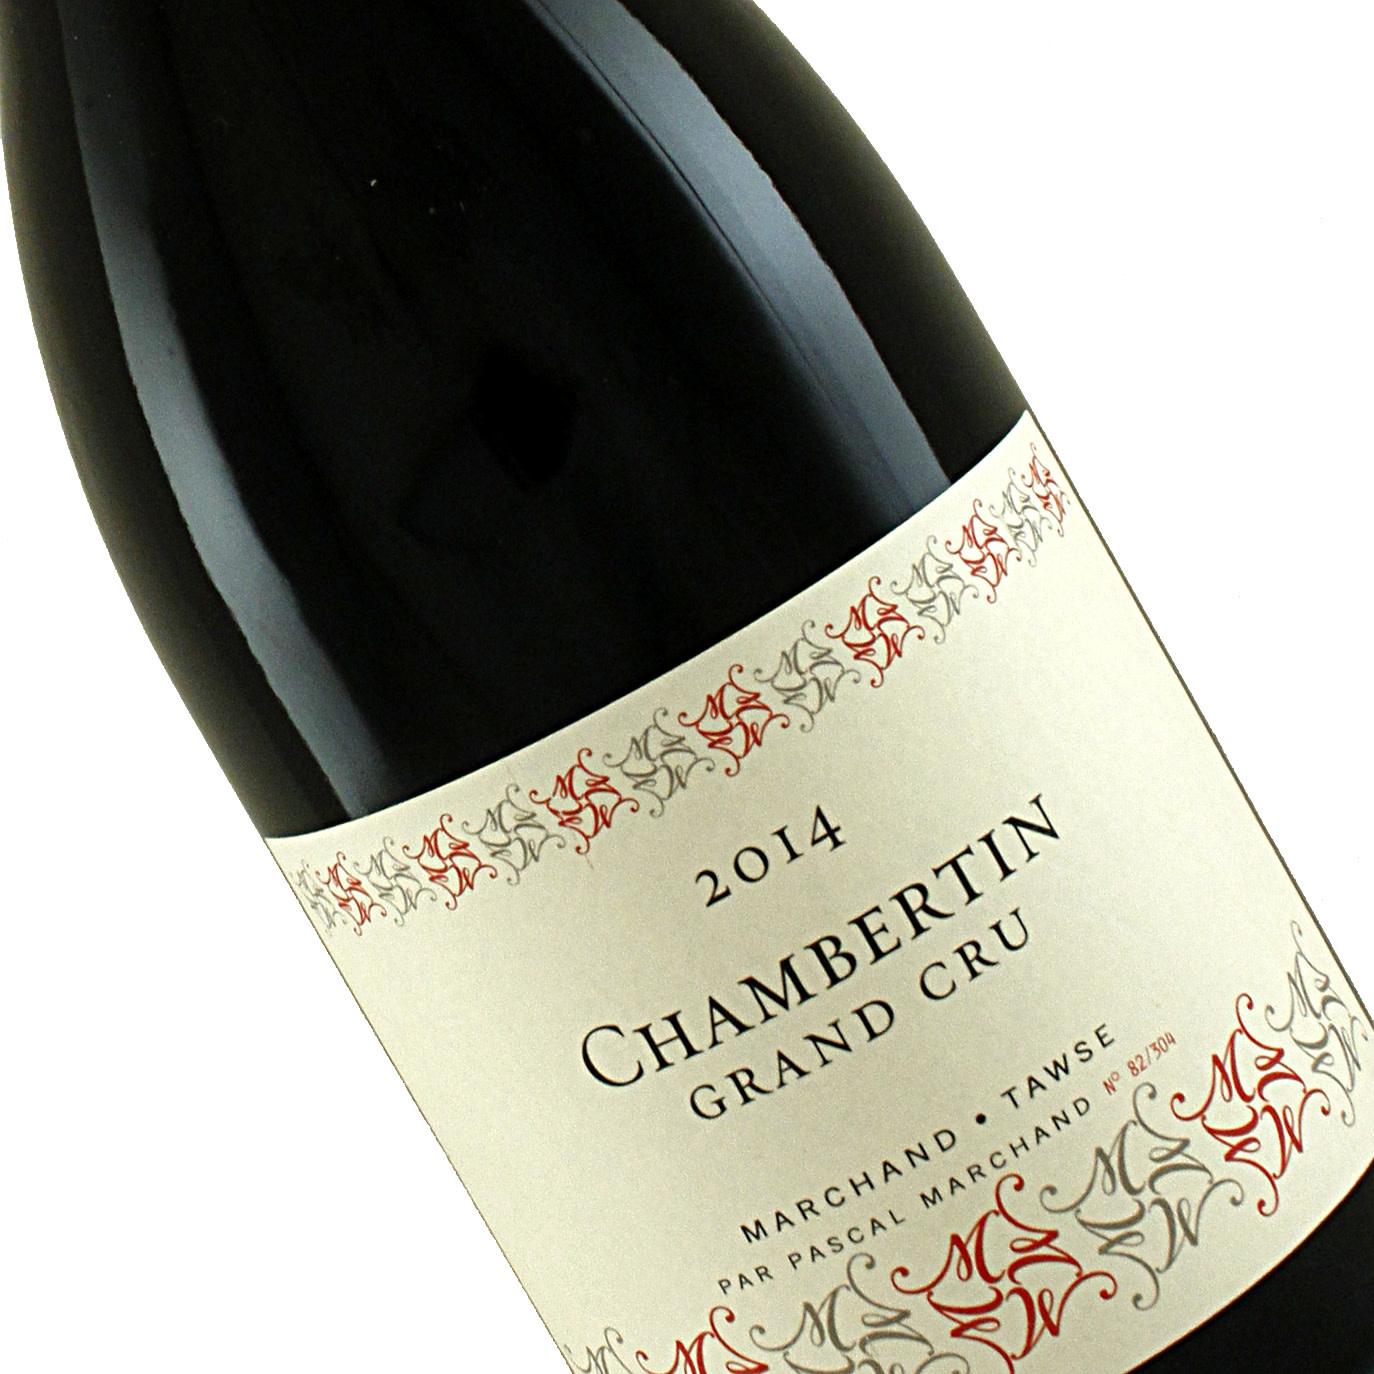 Marchand-Tawse 2014 Chambertin Grand Cru, Burgundy